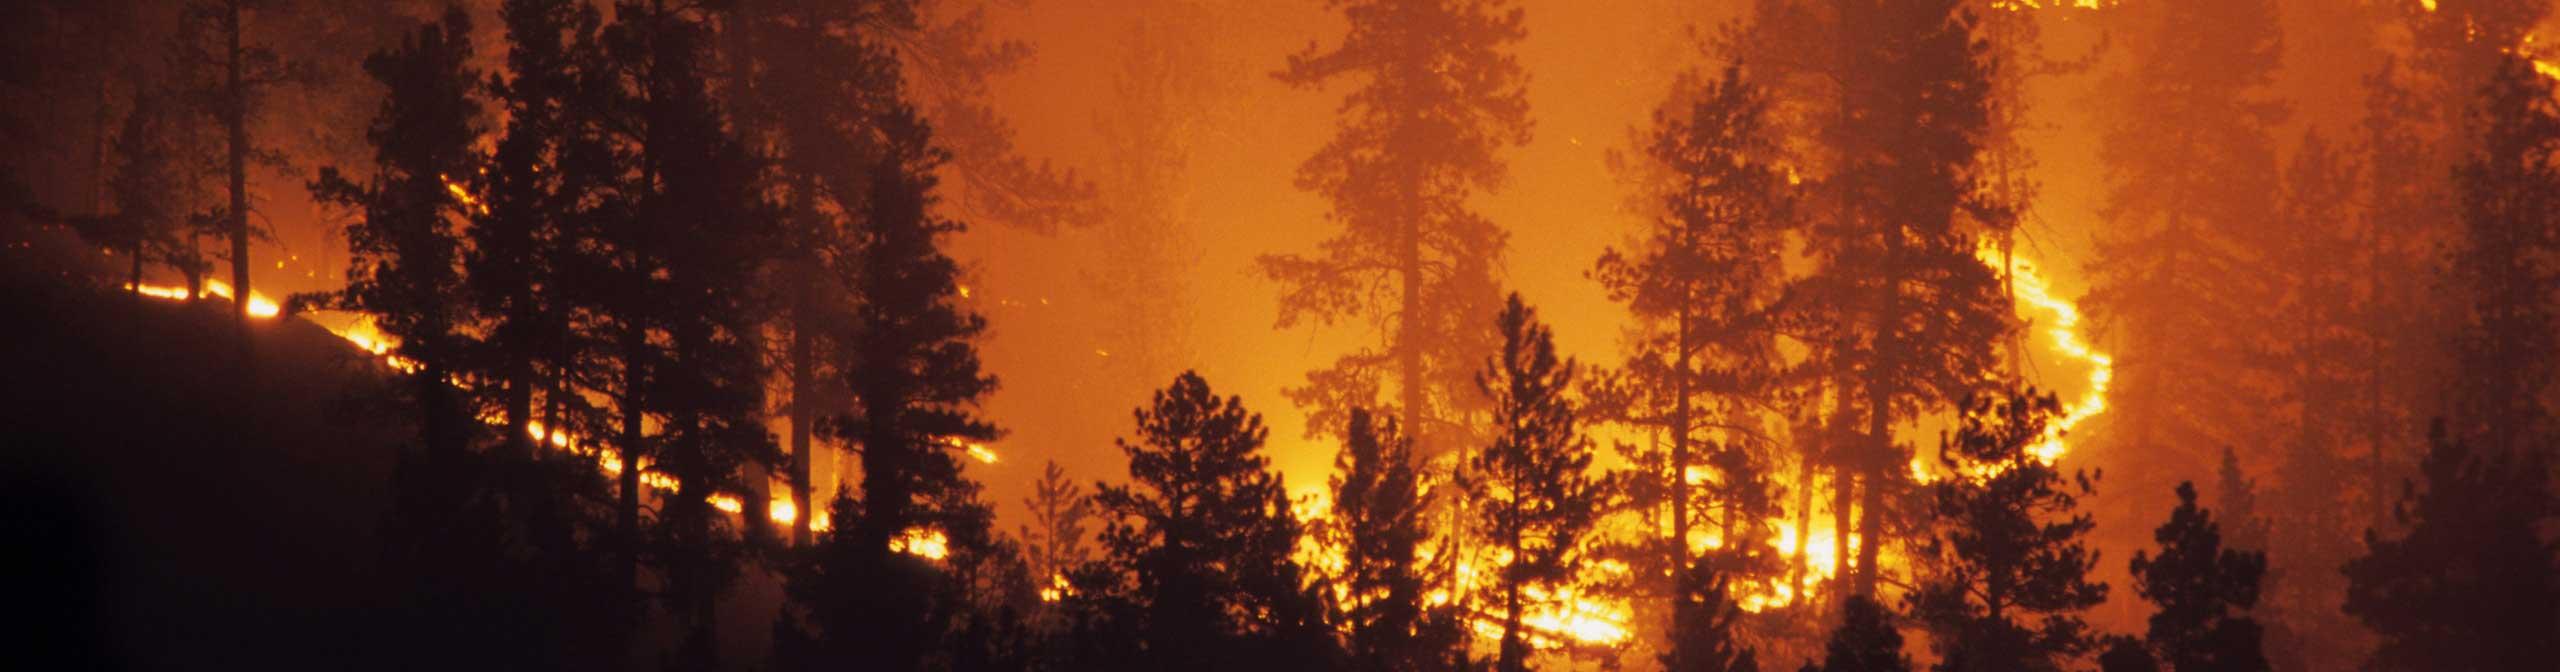 bushfire_attack_legislation-optimize.jpg